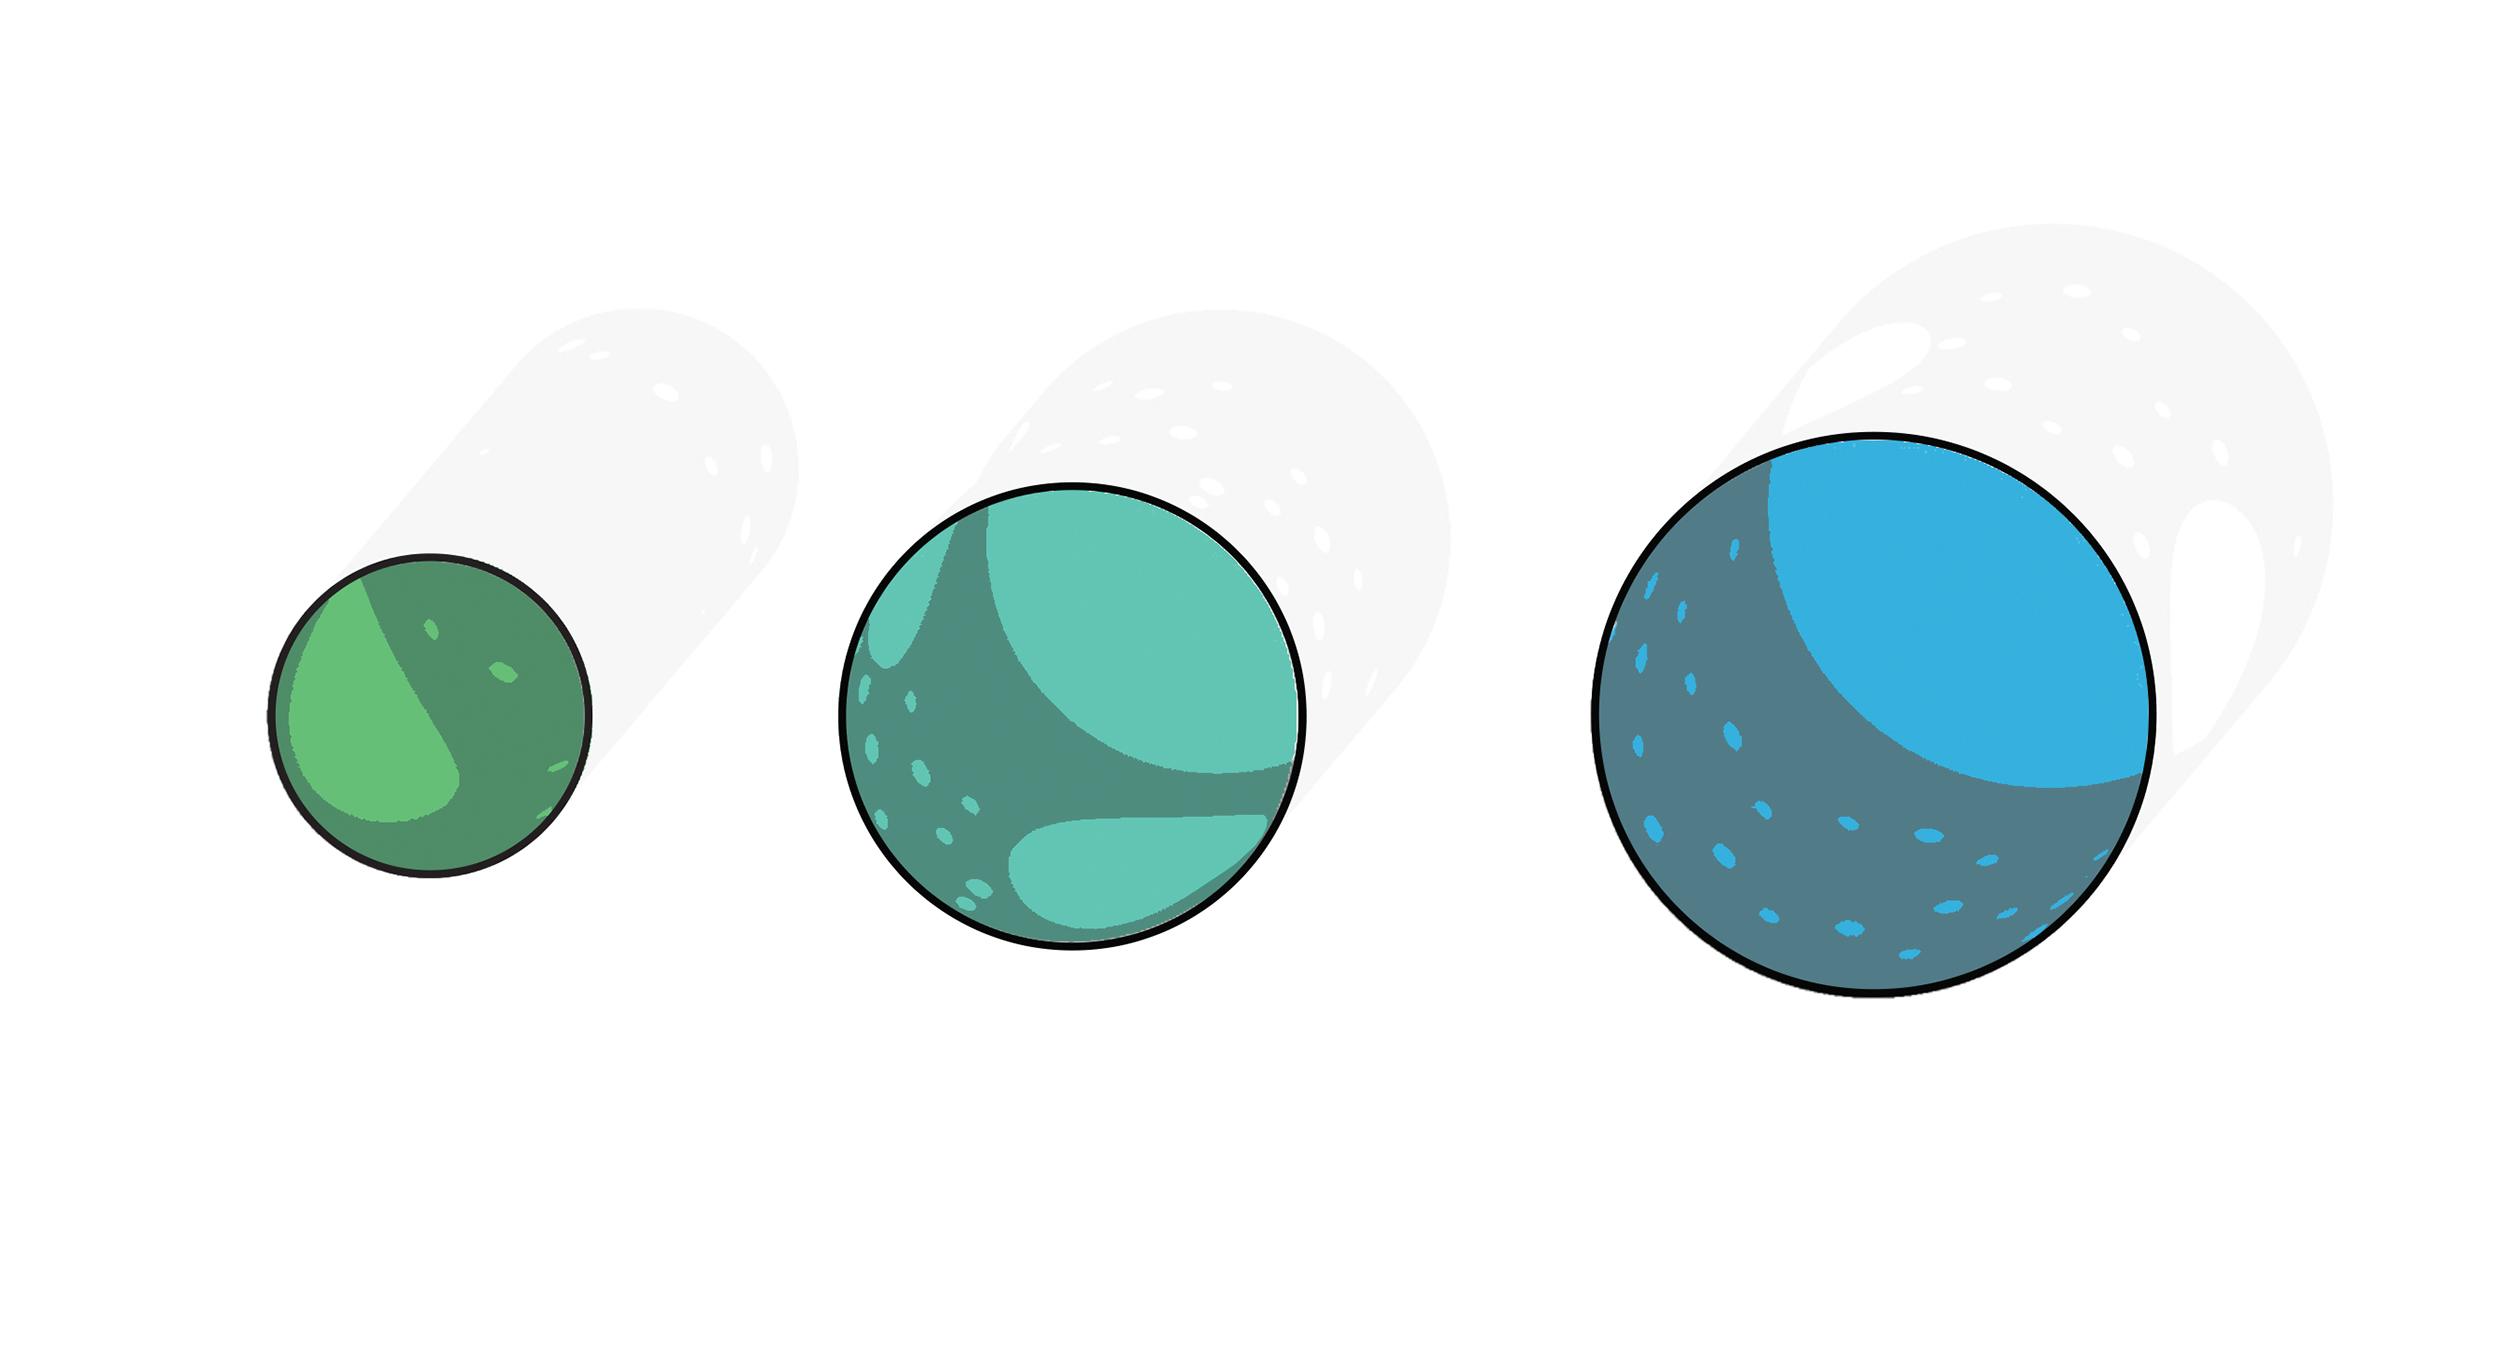 pop_up_spots_3_plan.jpg